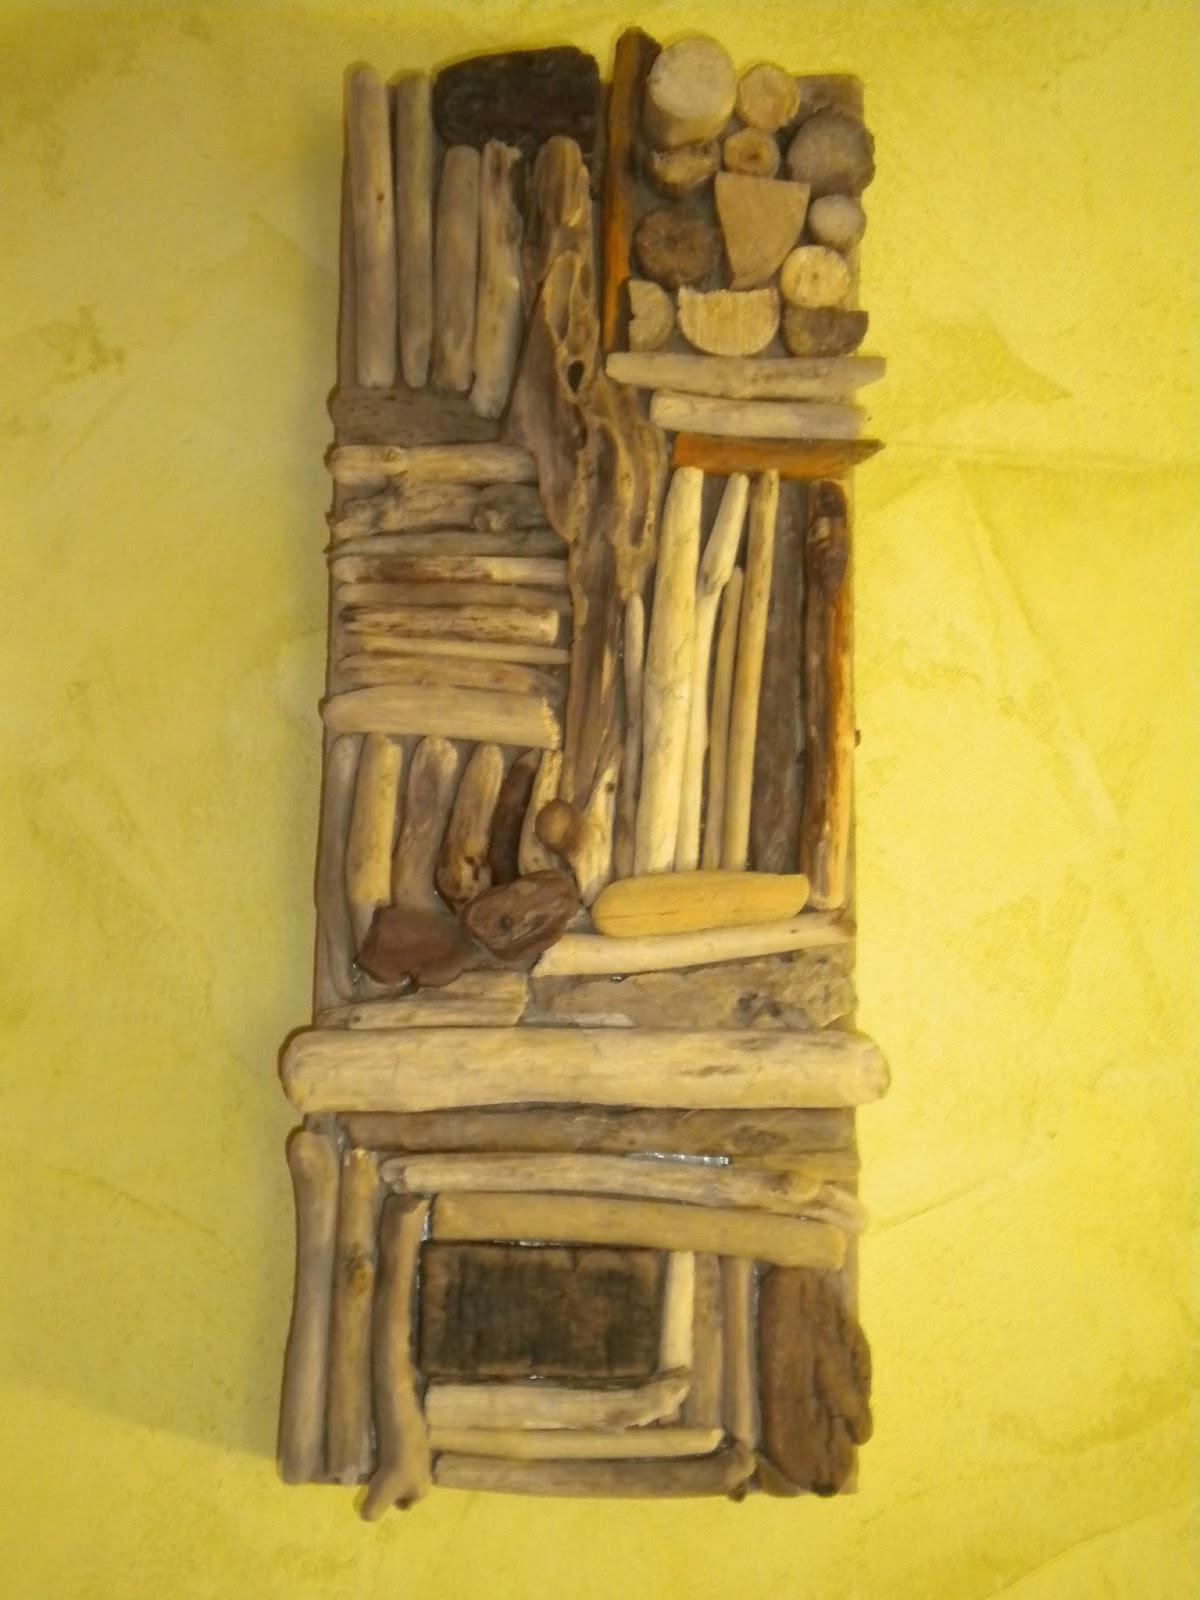 latelierdepec: TABLEAU 3D EN BOIS FLOTTE